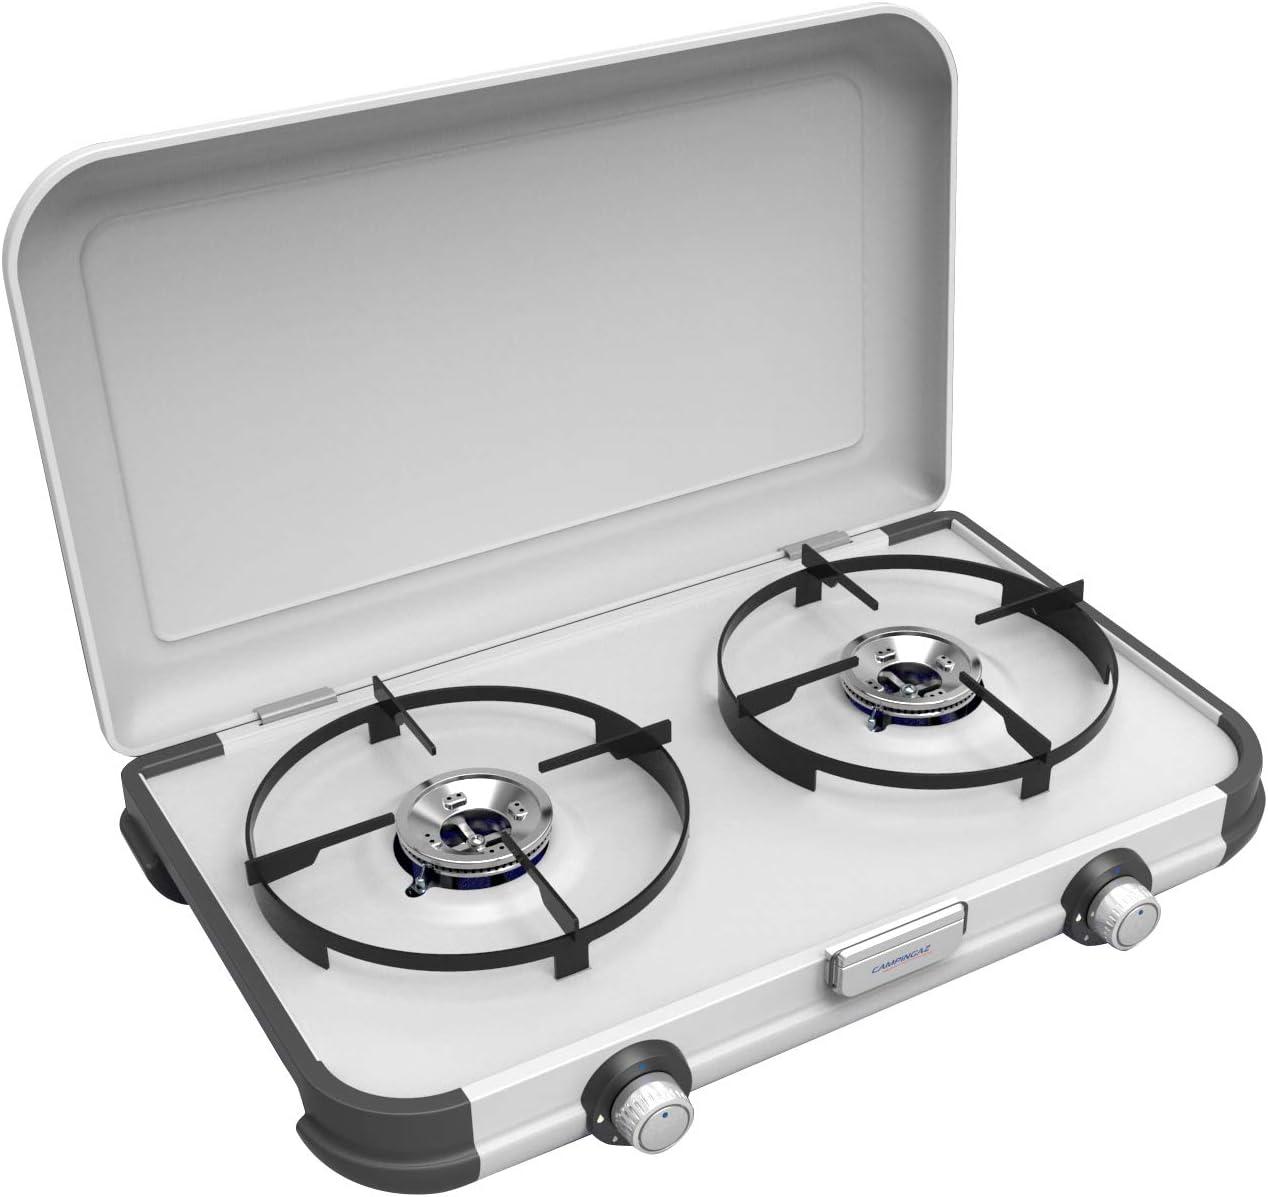 Campingaz, cocina de gas portátil con dos quemadores, parrilla al aire libre